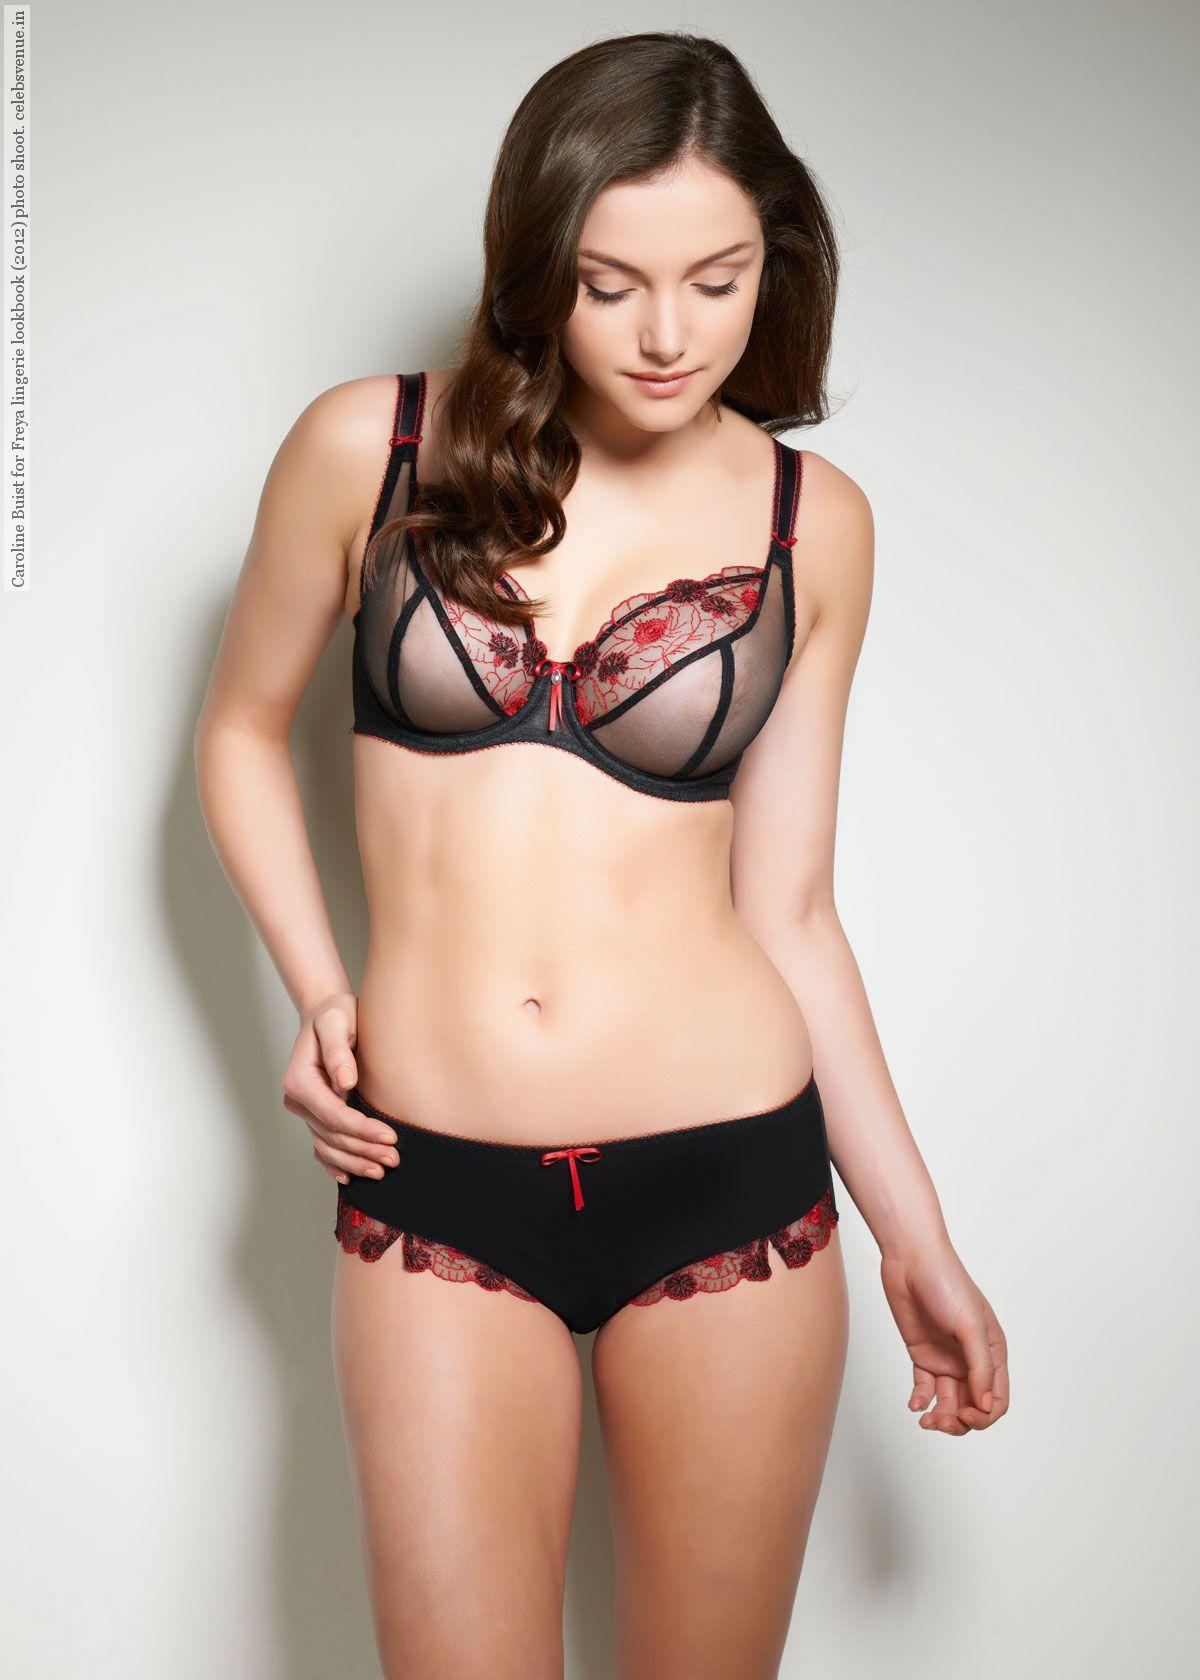 Caroline Buist